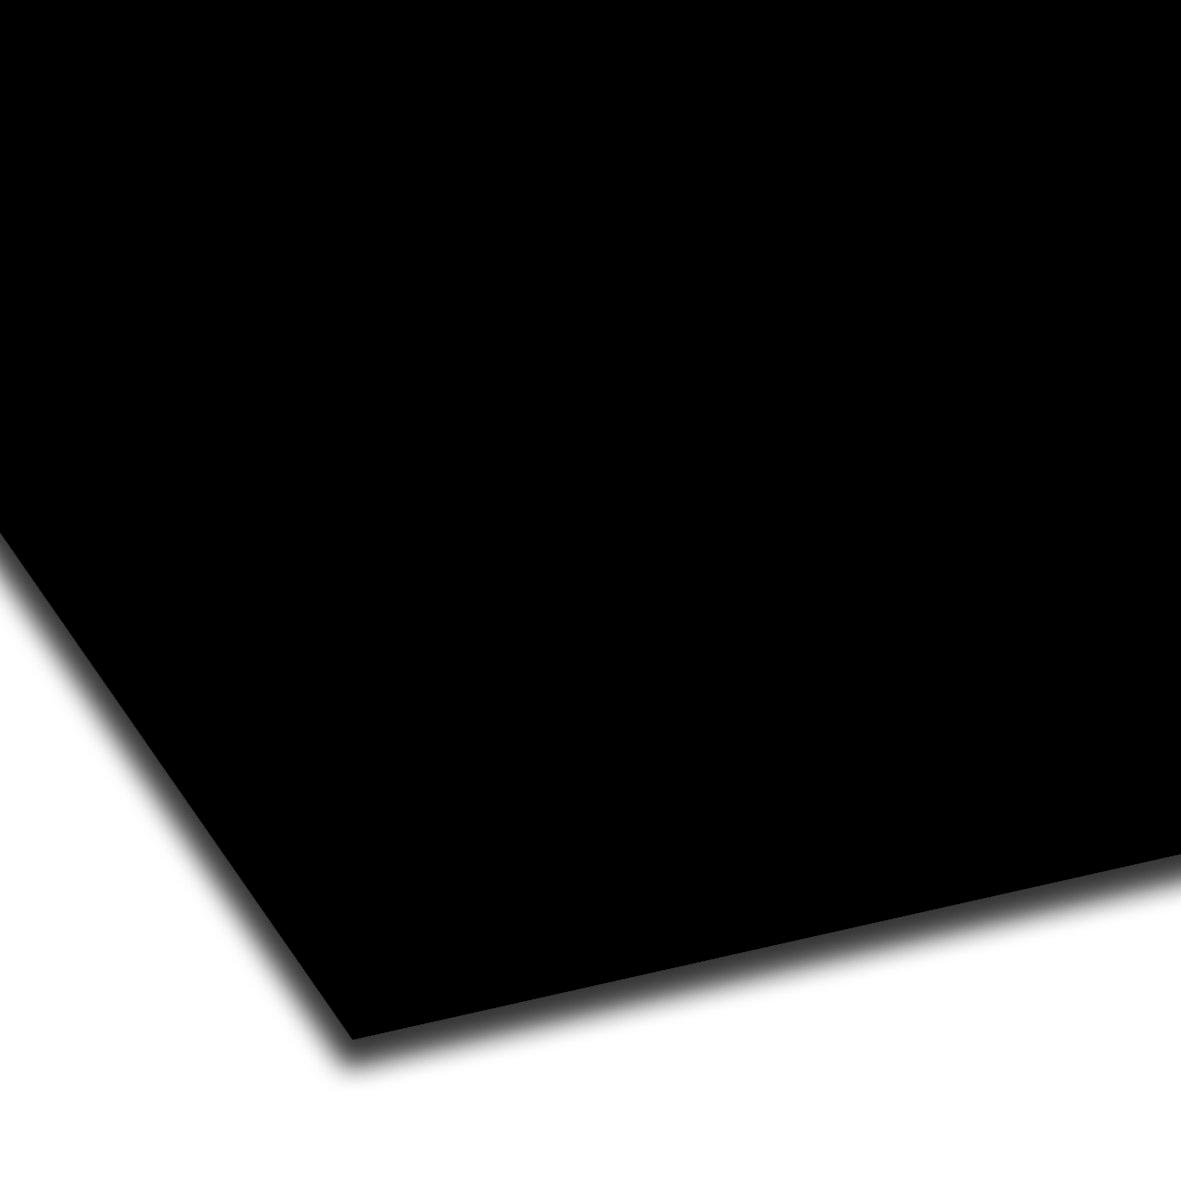 Cyrus Light 1000 x 2500 mm Black hochglanz 1800